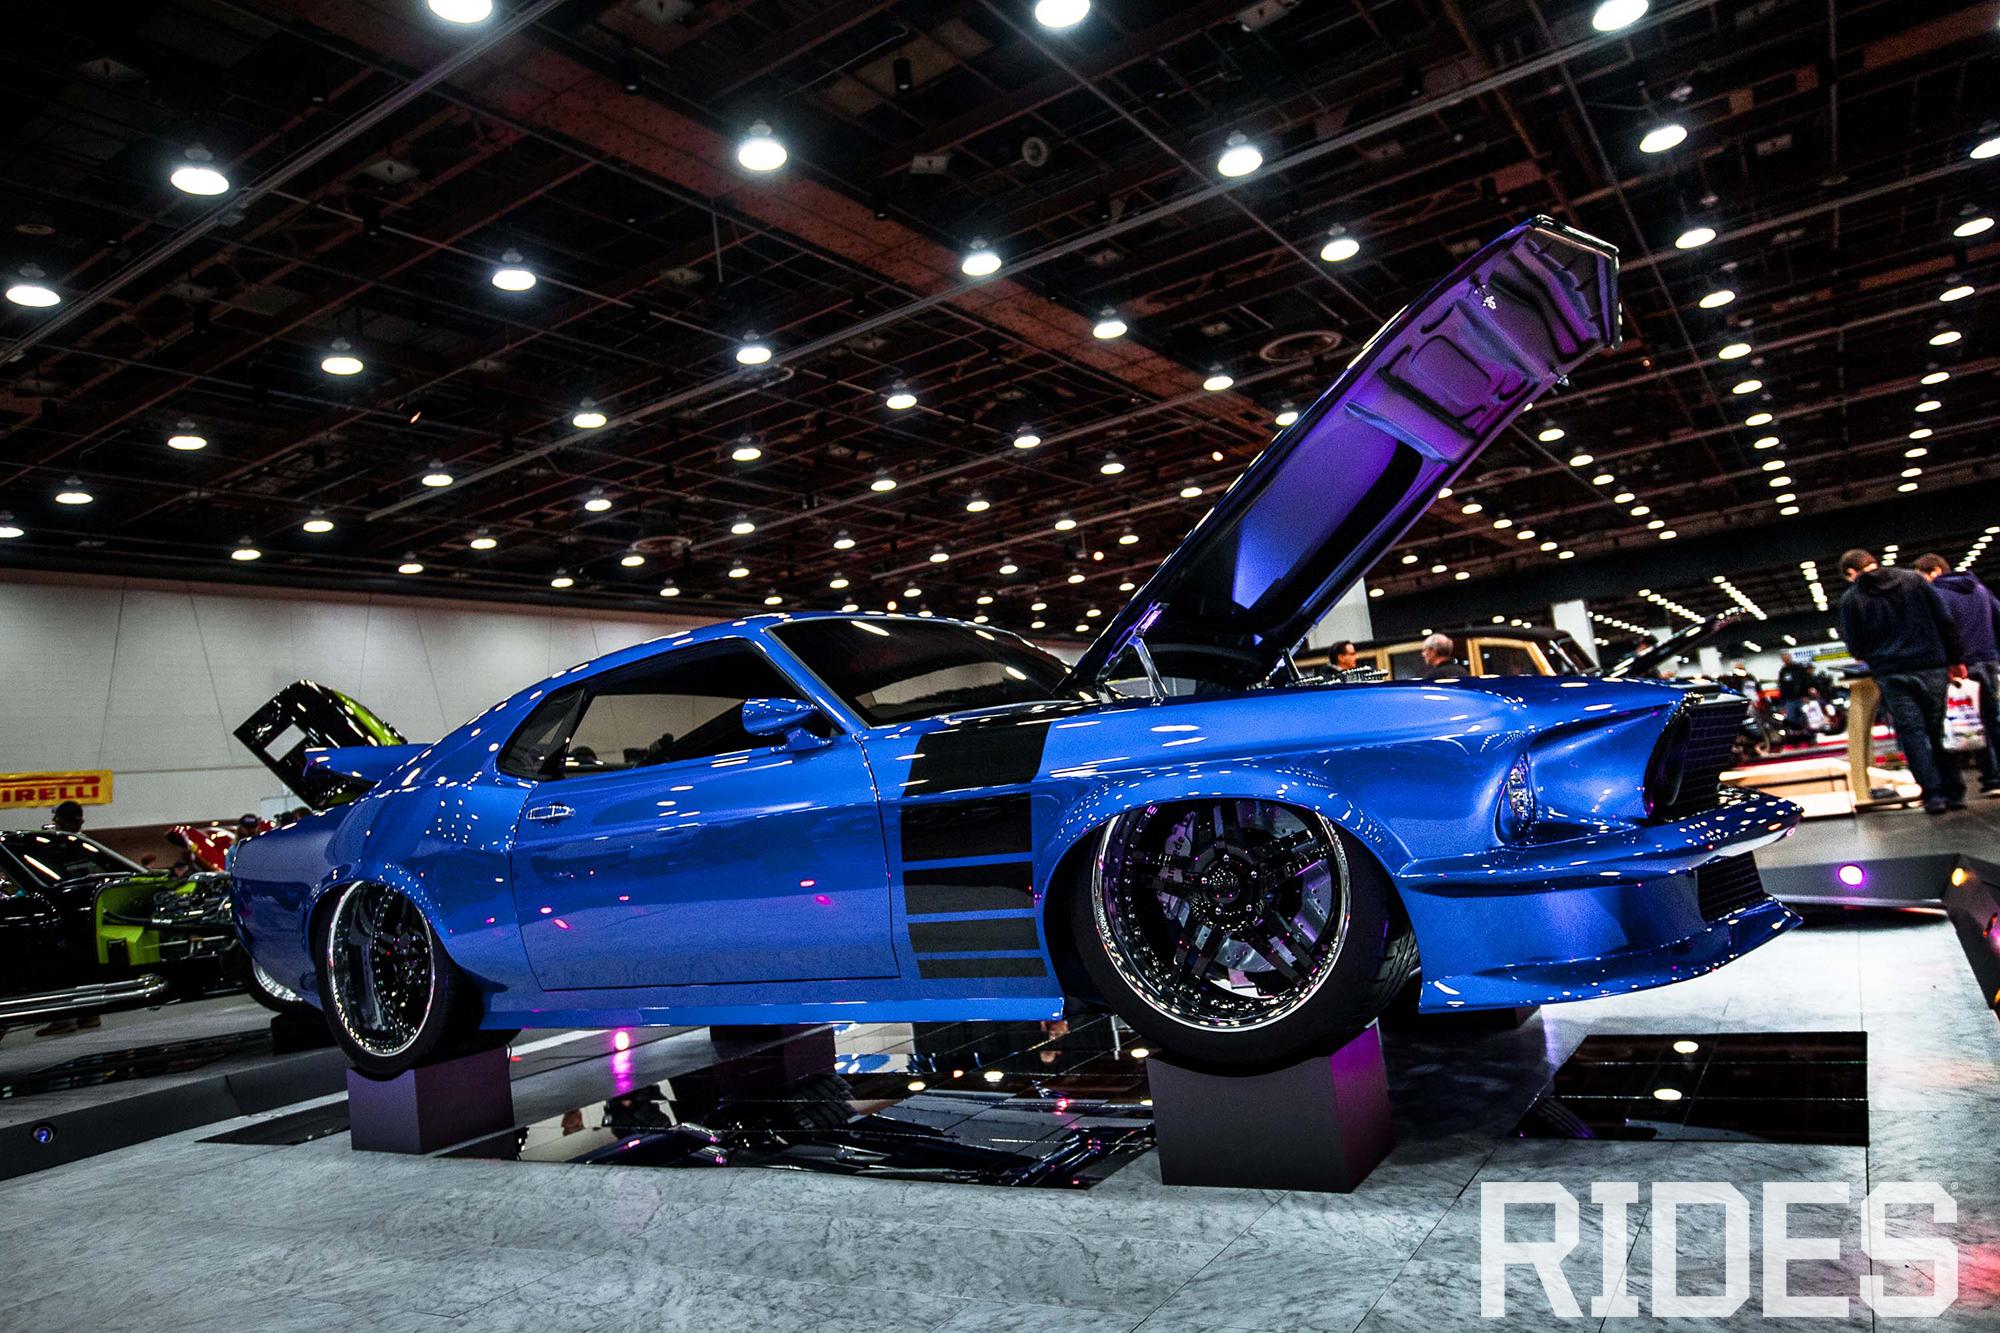 Detroit Autorama 2015 Rides Magazine